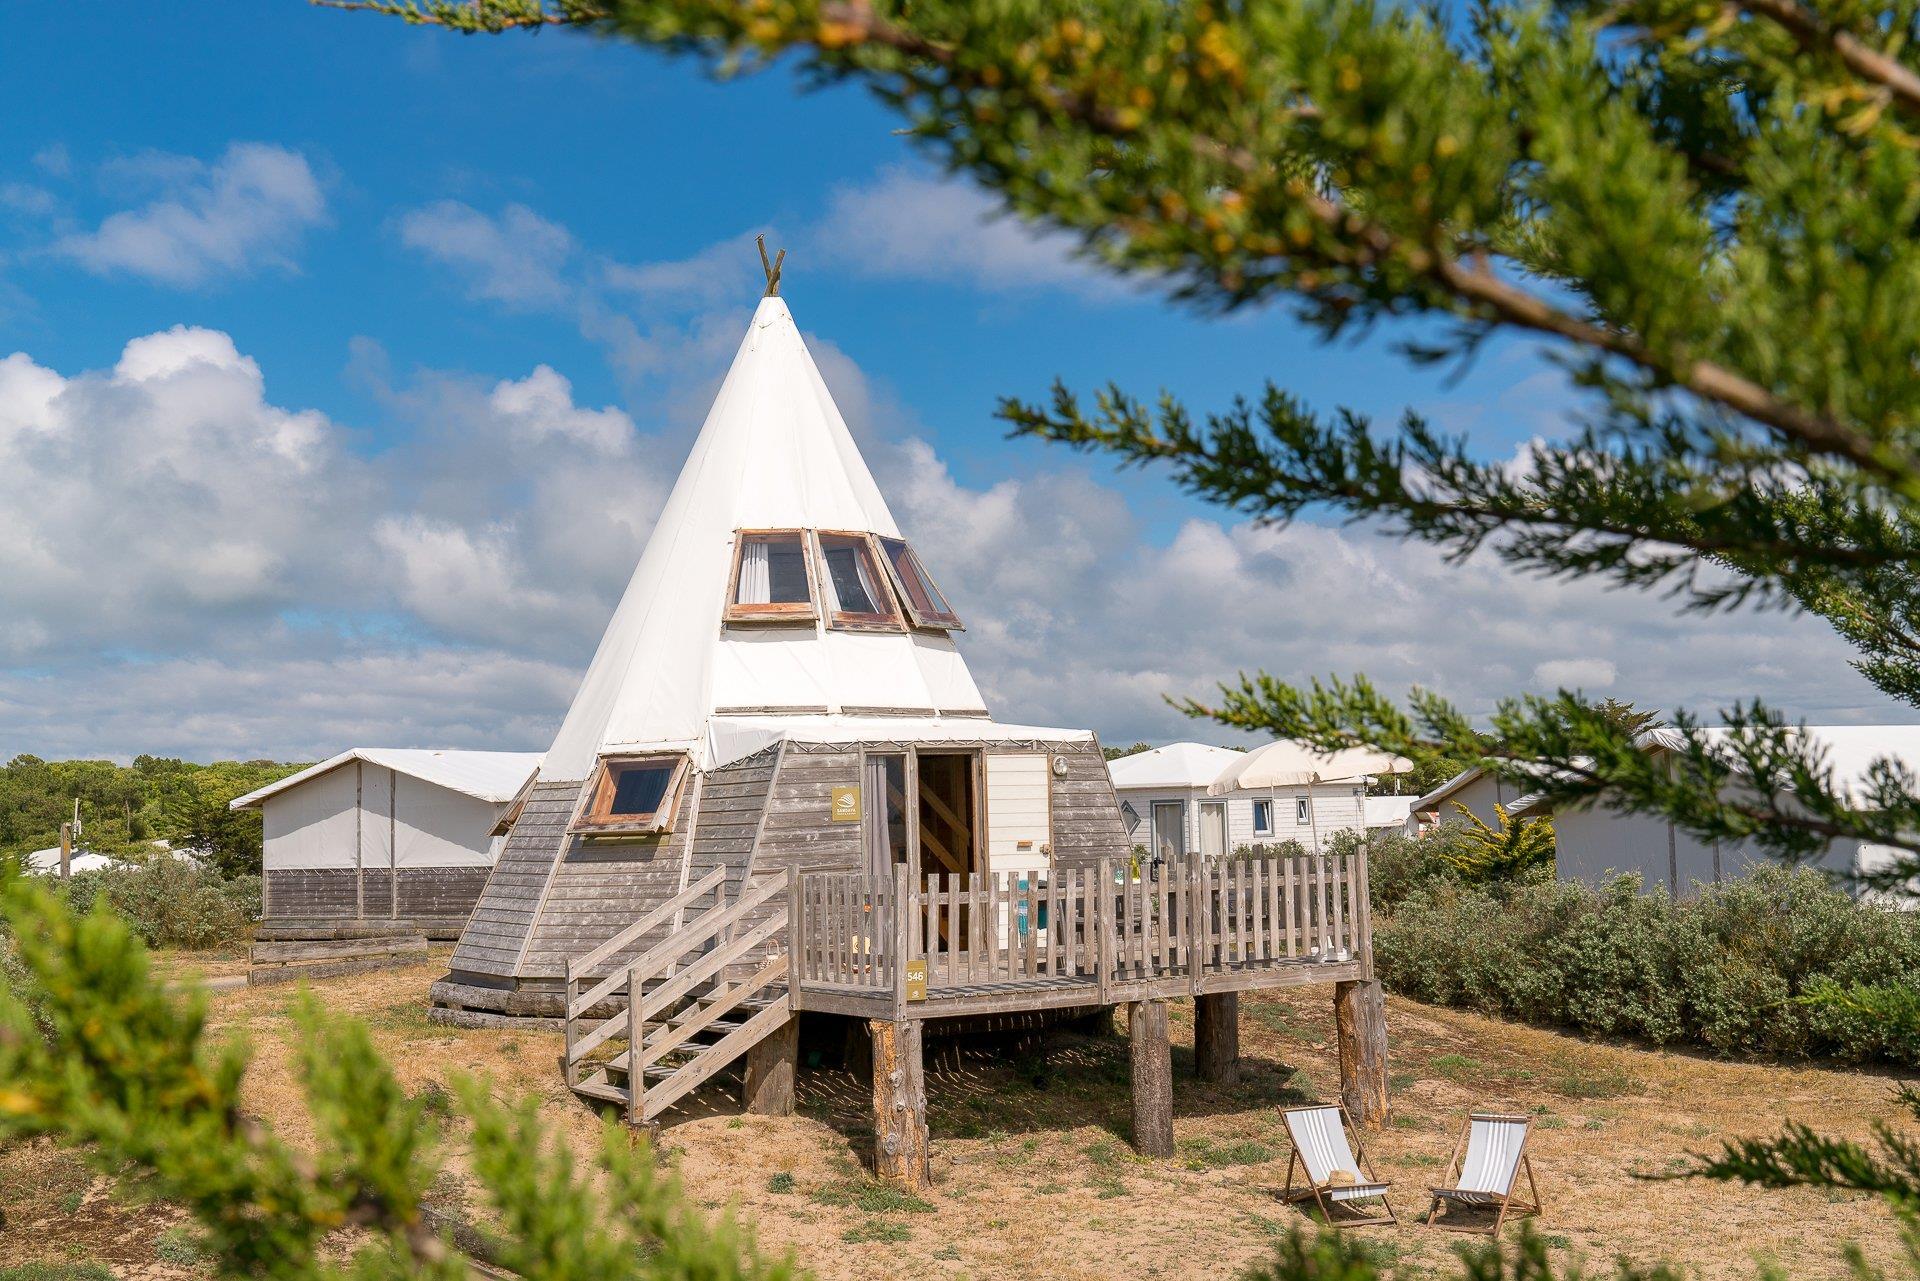 Location - Lodge Magic Tipi - 1 Chambre - Camping Sandaya Domaine Le Midi